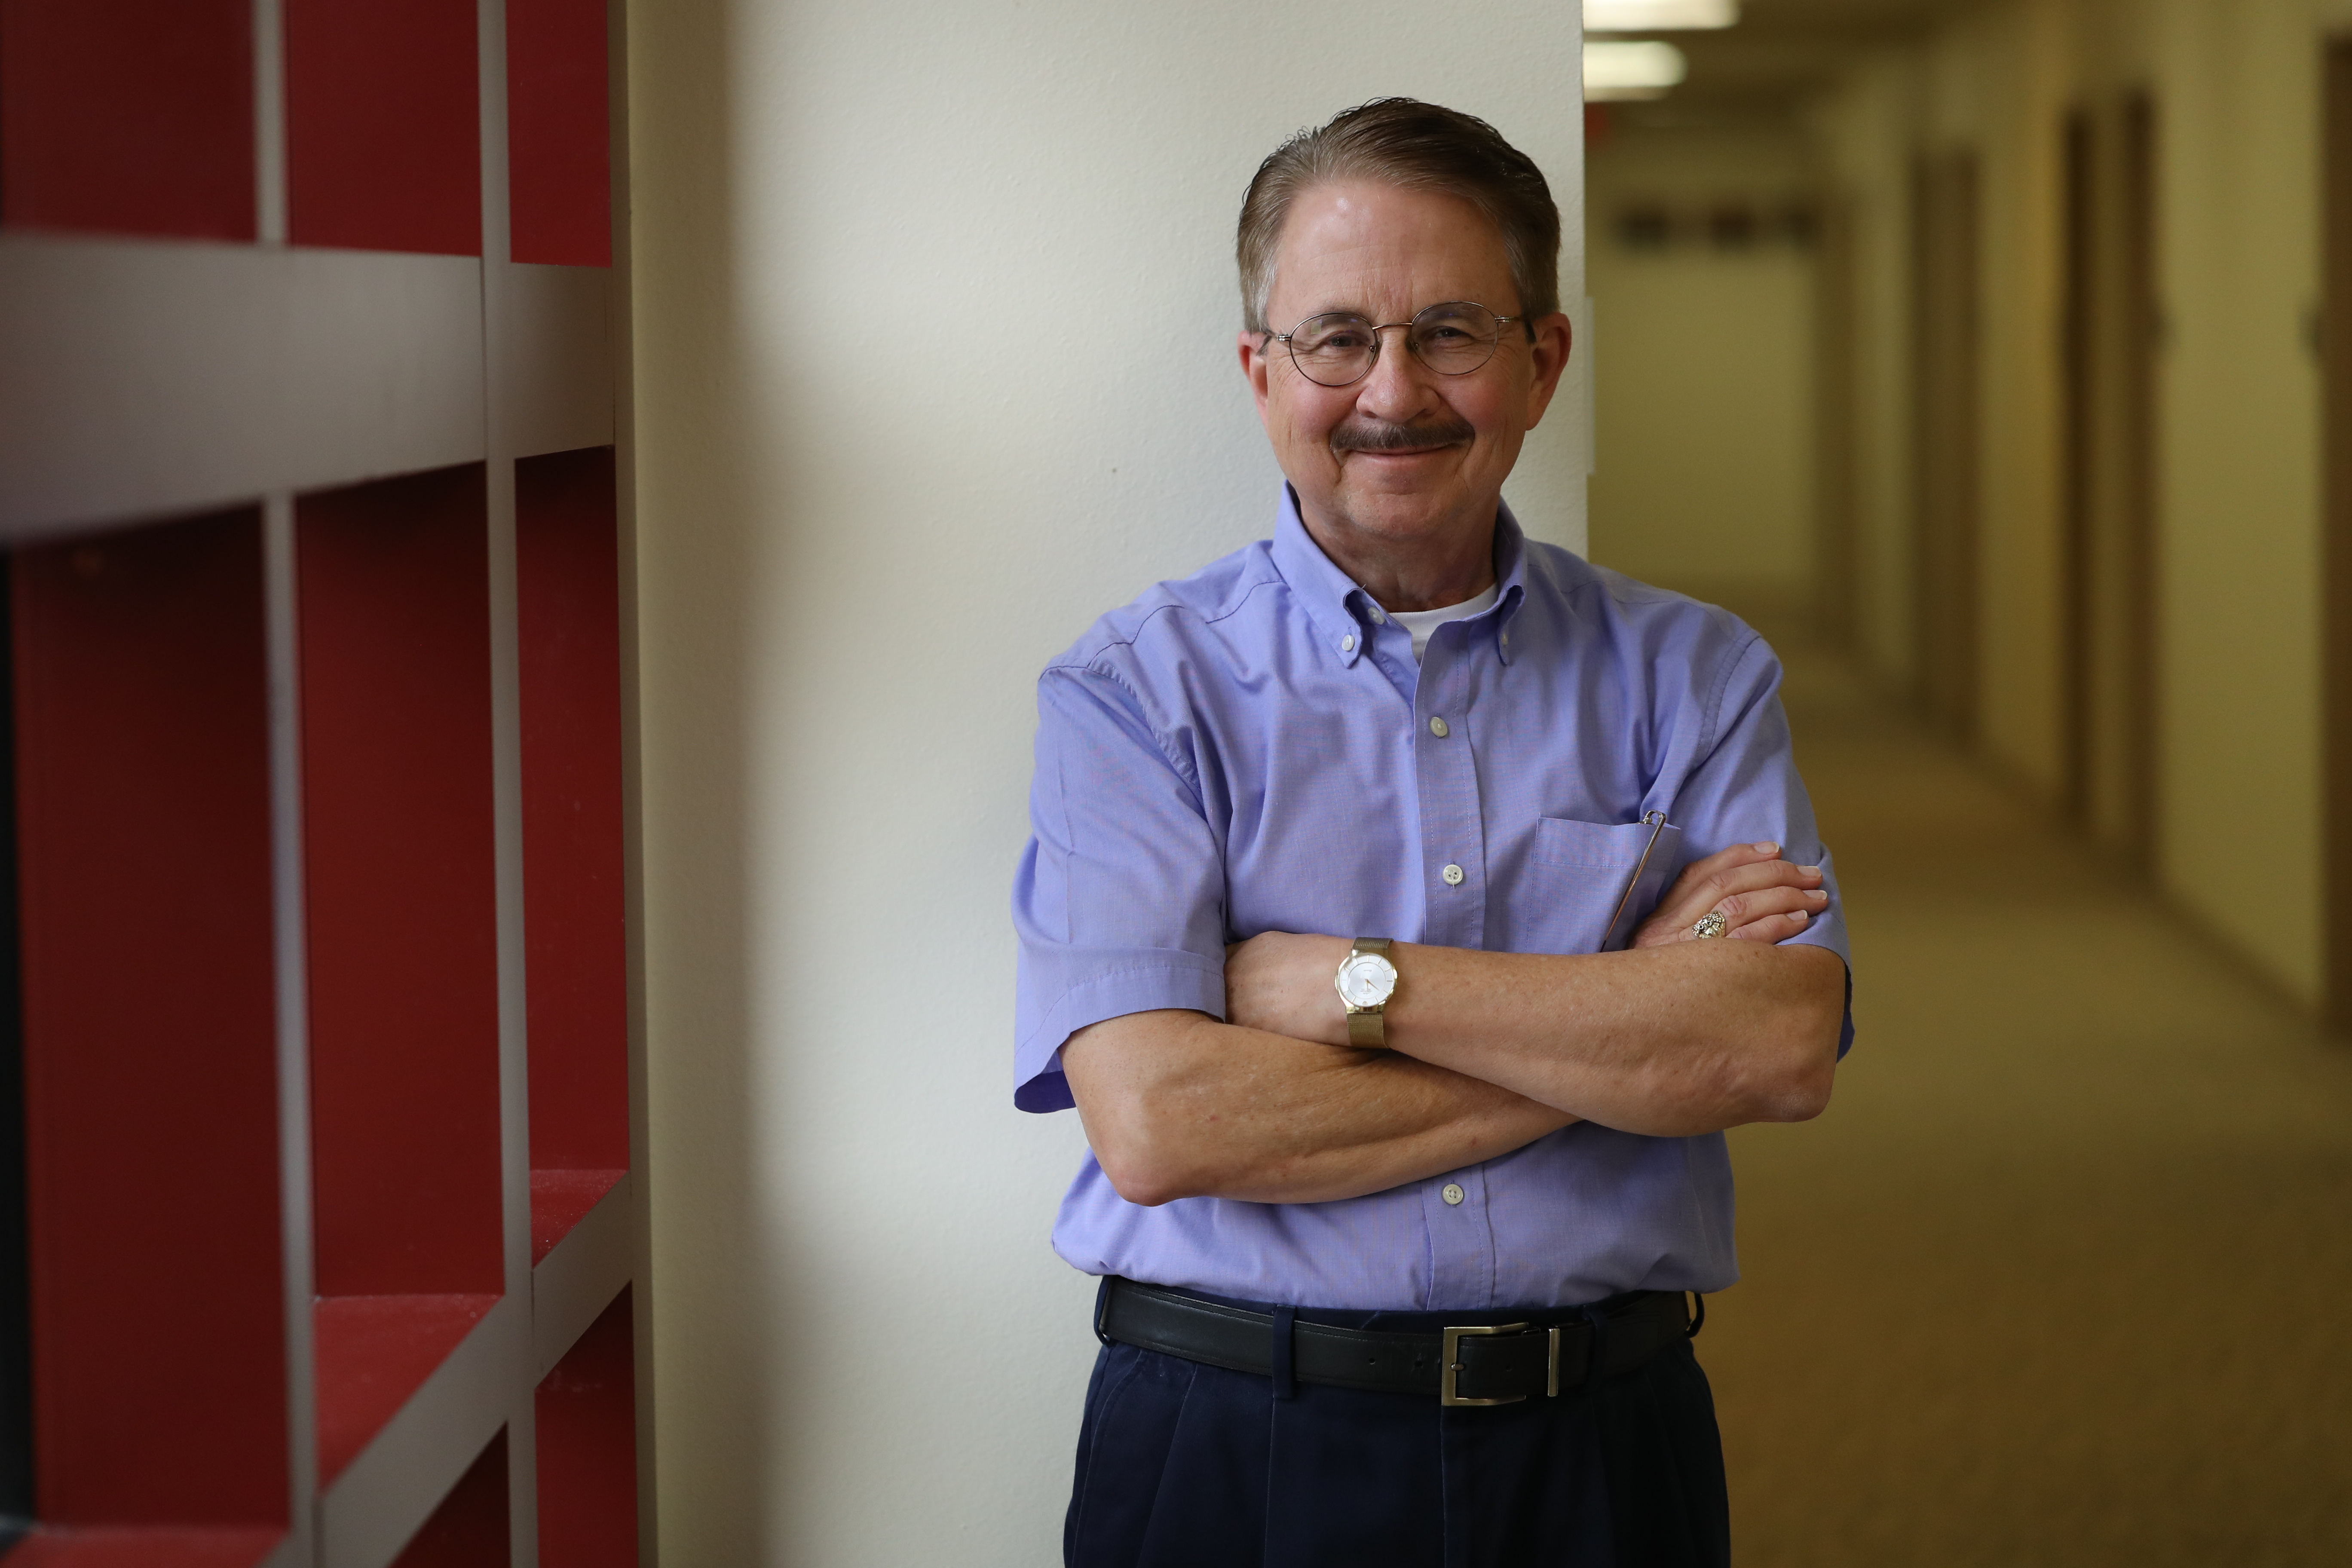 Dr. Roger Olson